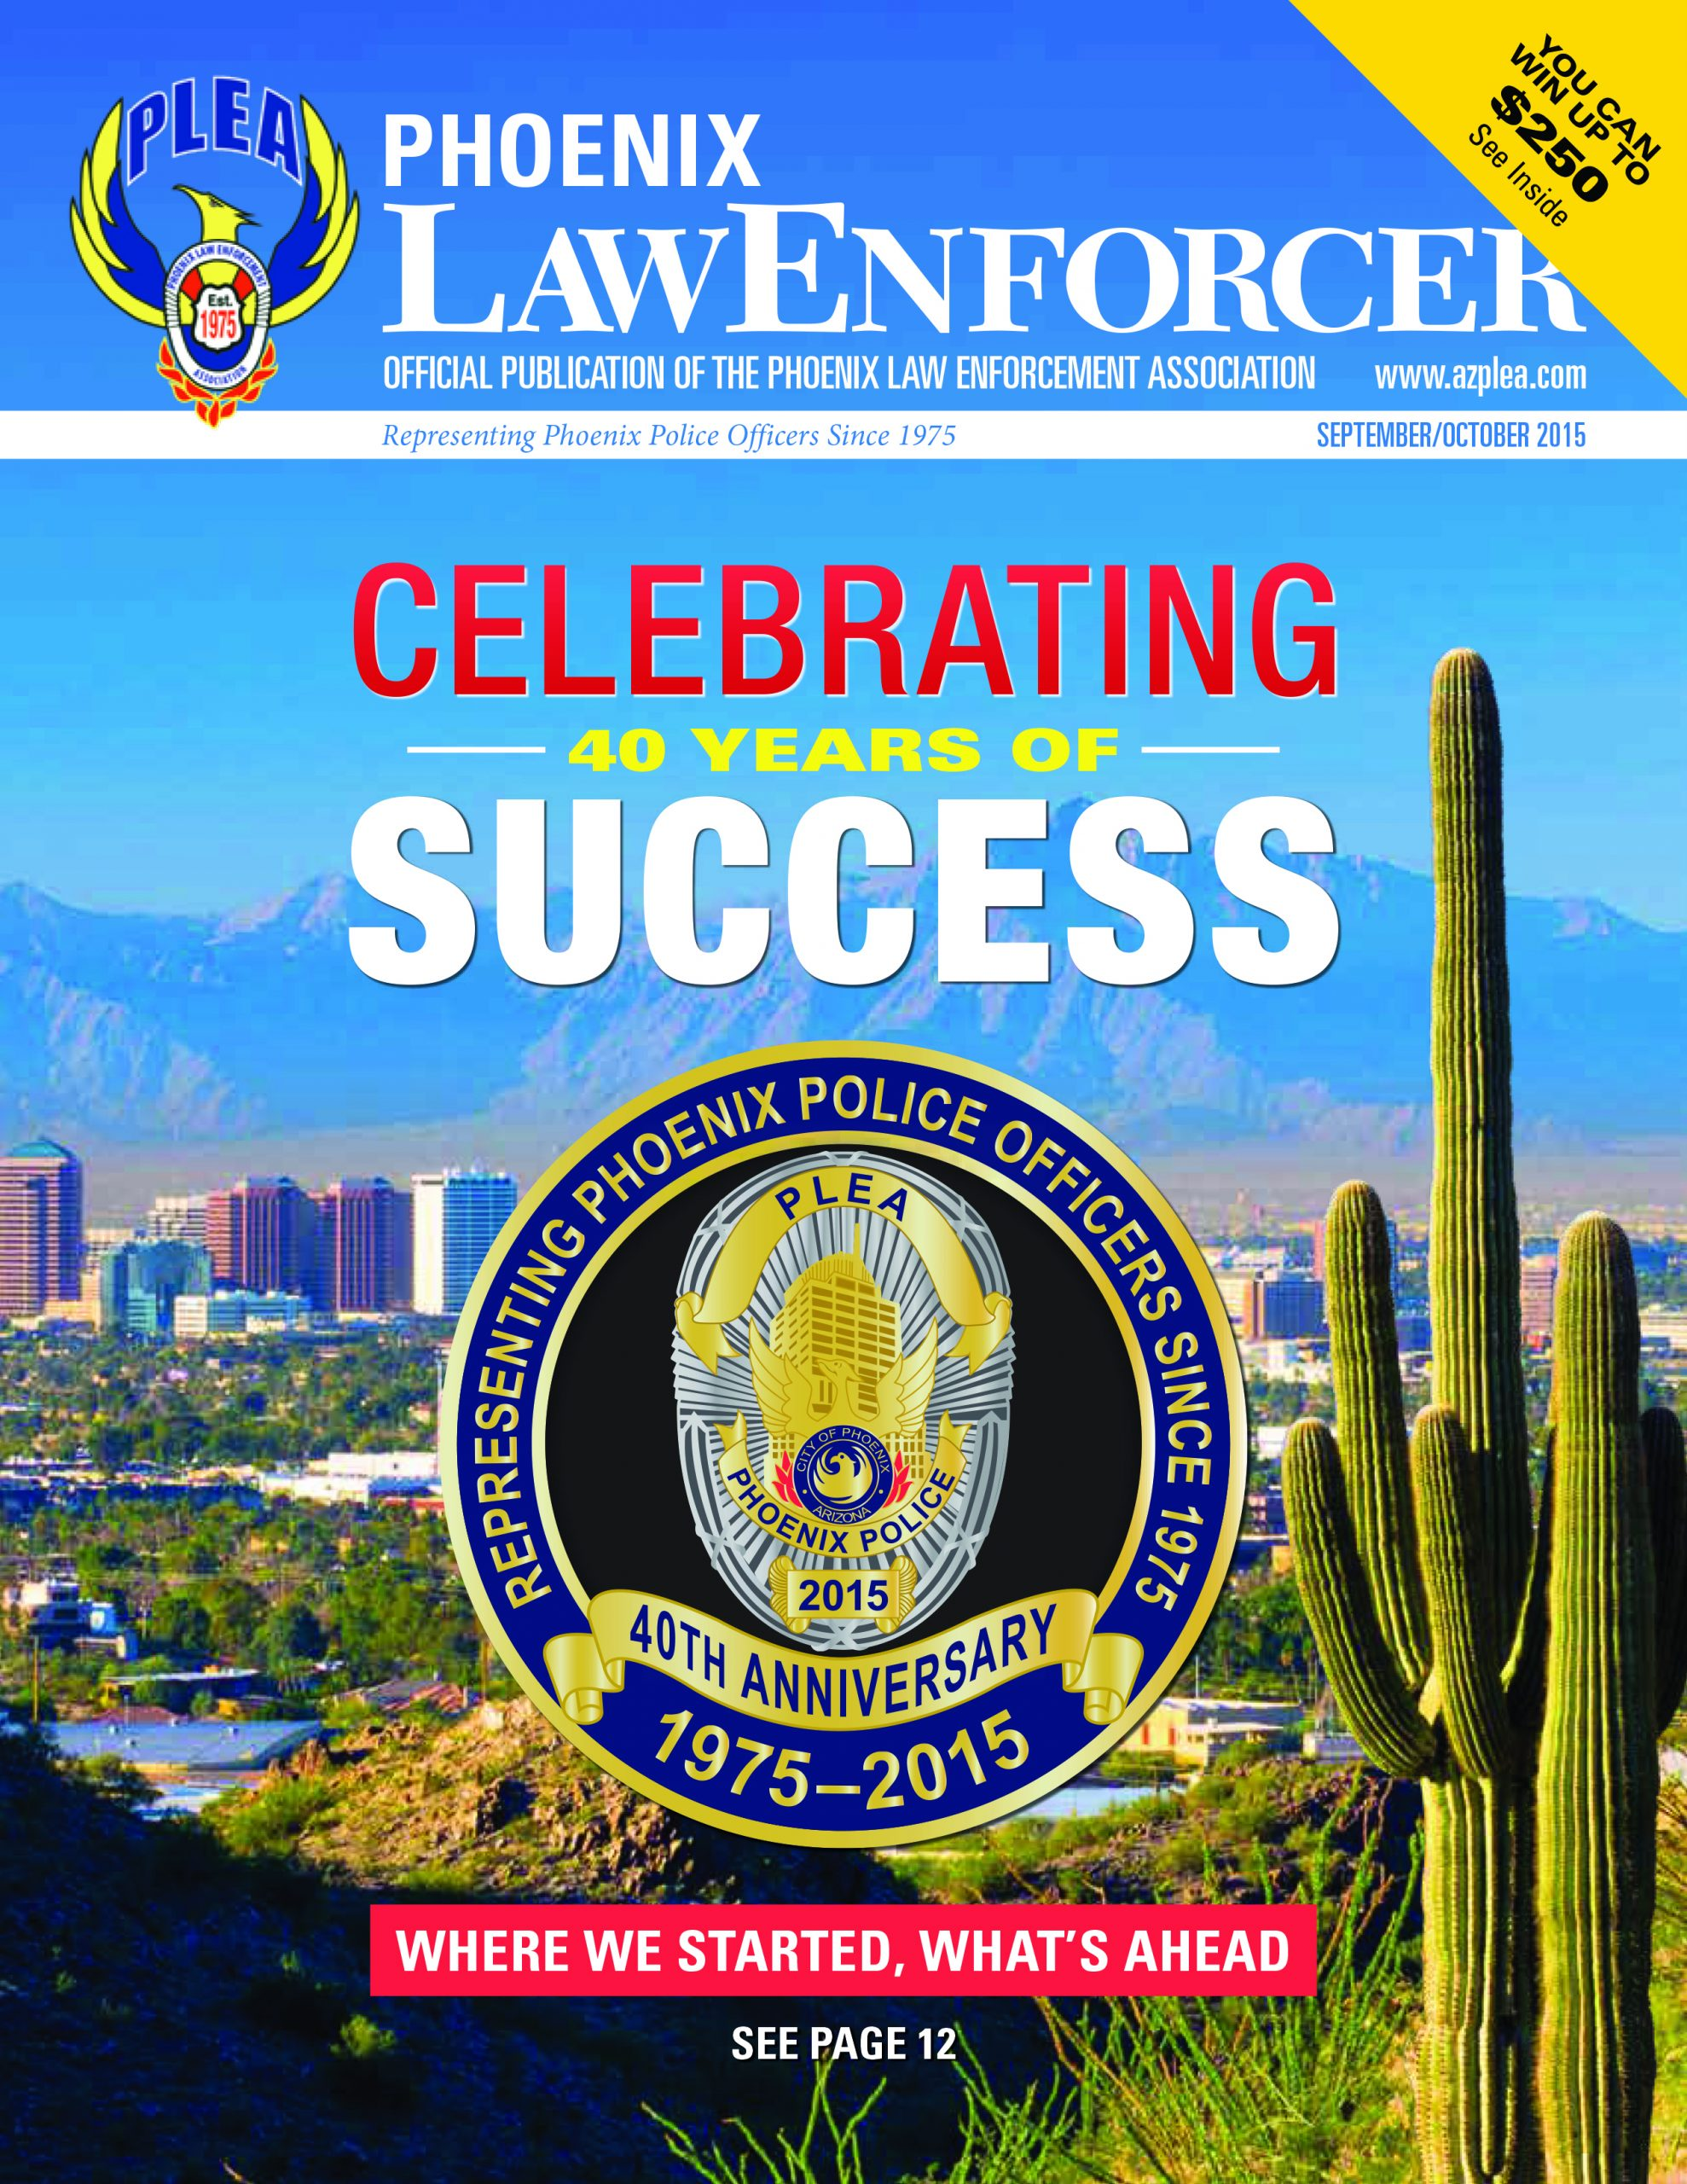 Phoenix Law Enforcer – September/October 2015